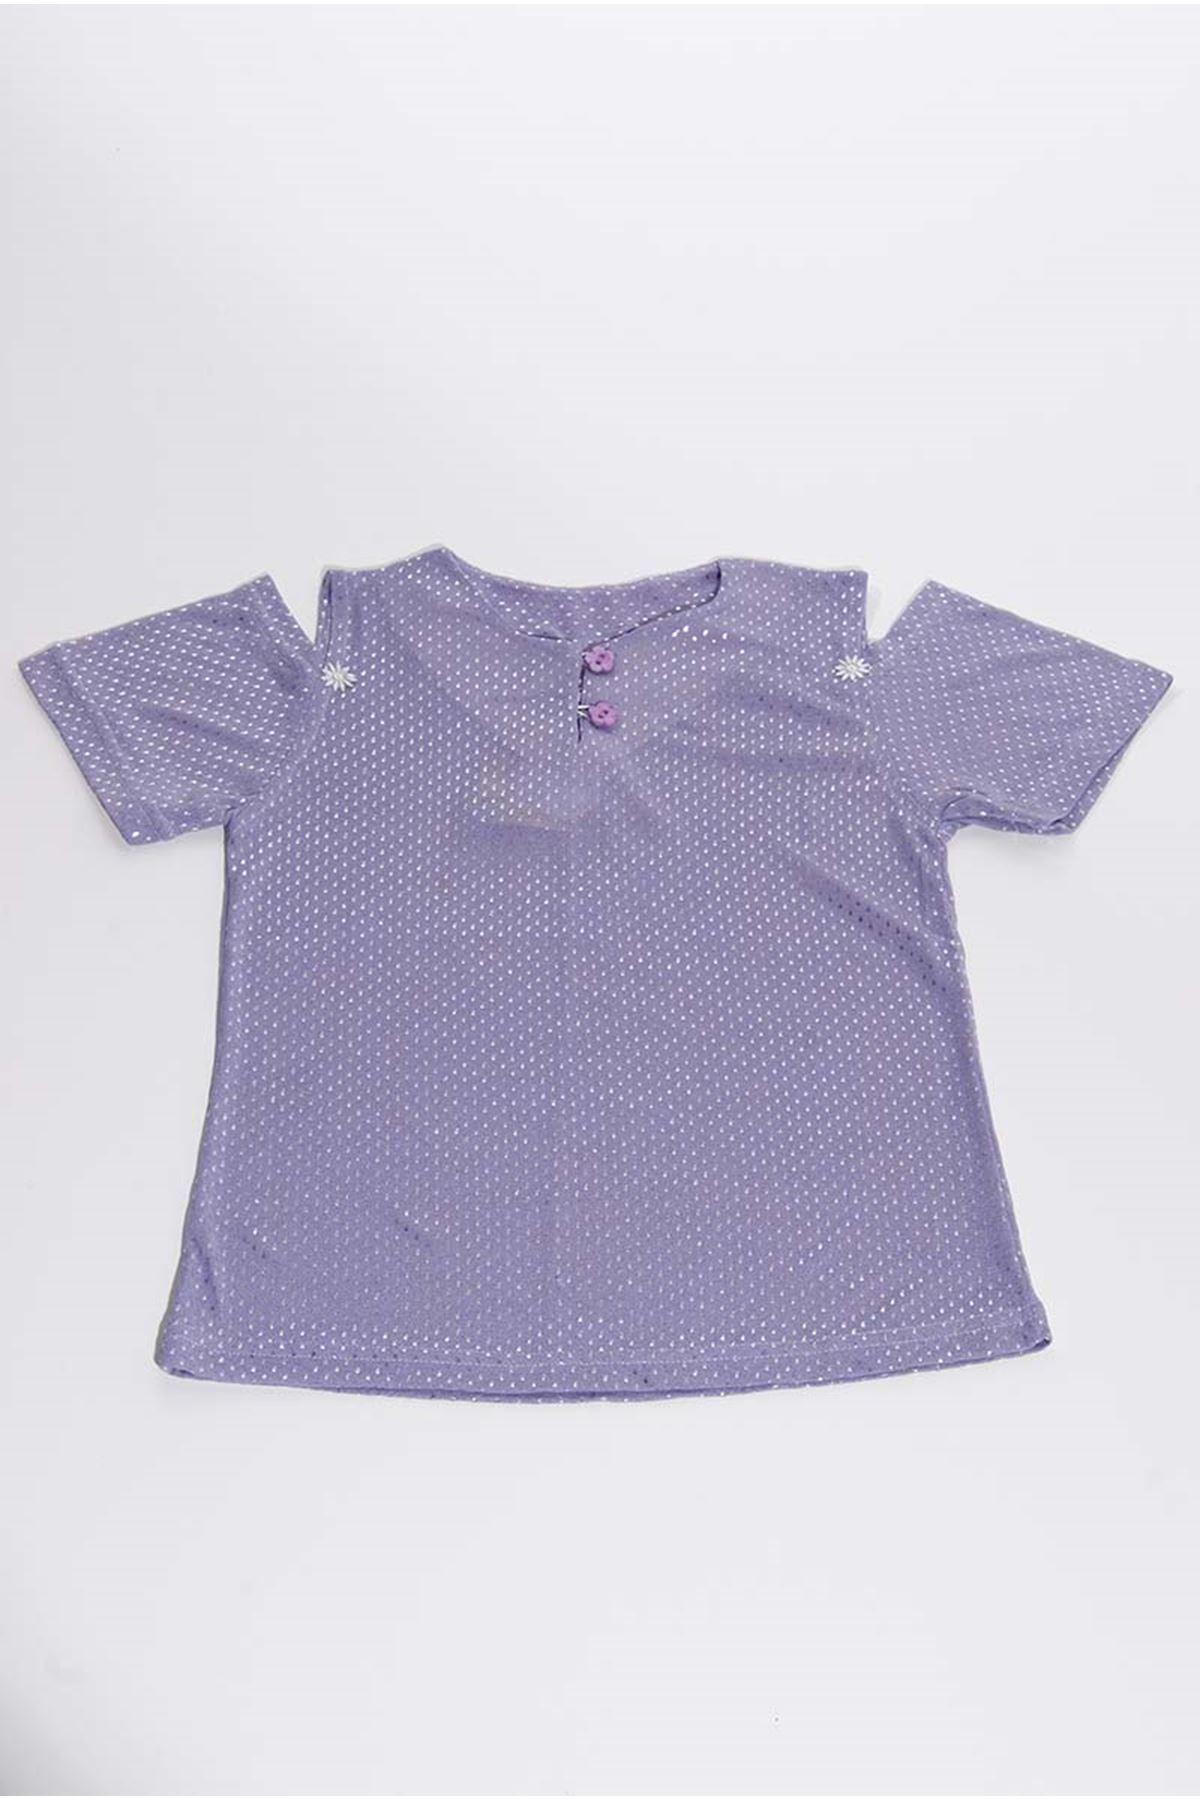 Kız Çocuk Bluz 16B-4159